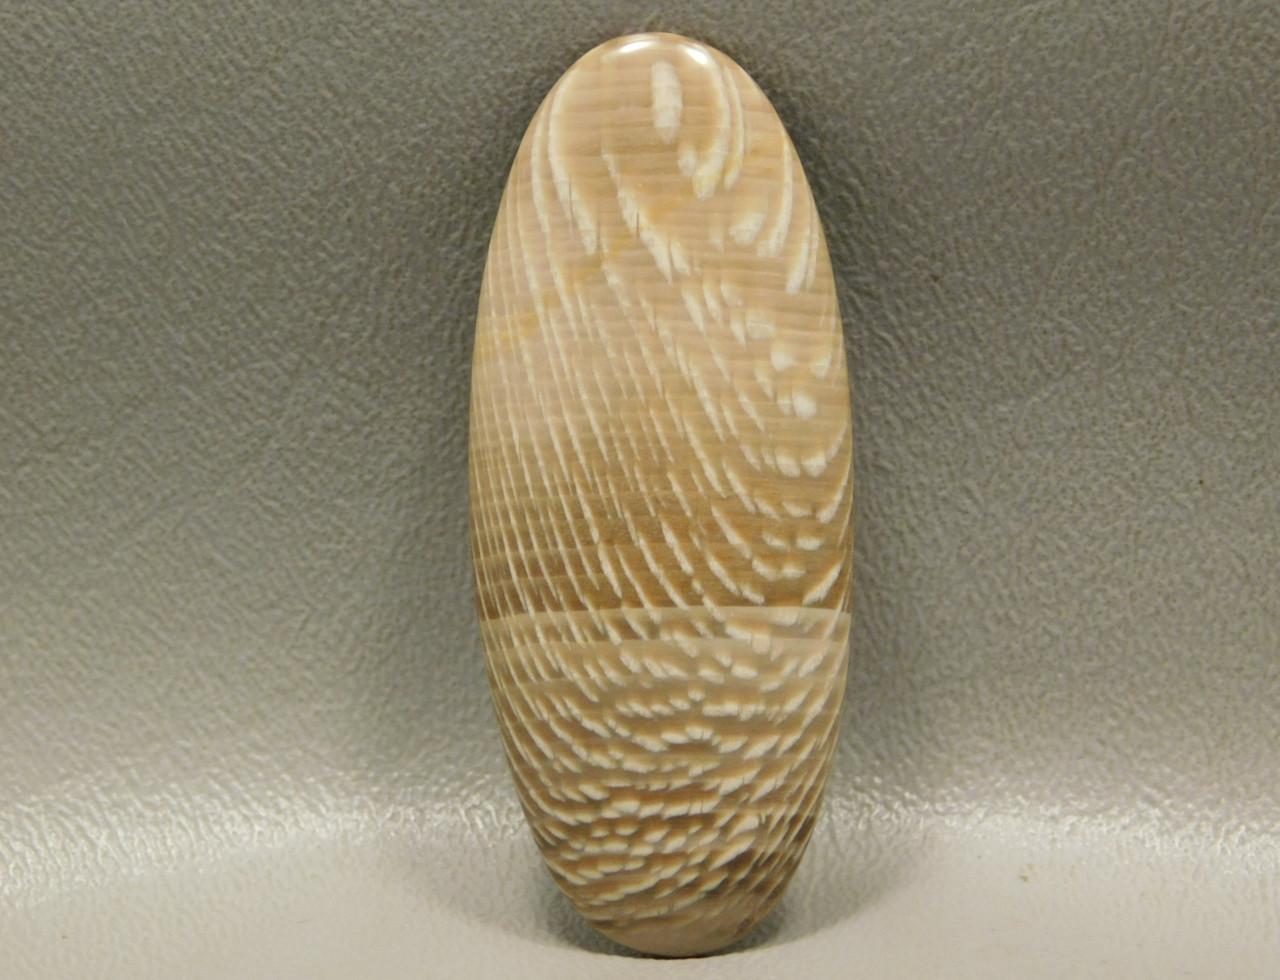 Petrified Wood Badger Creek Sycamore Large Stone Cabochon #3